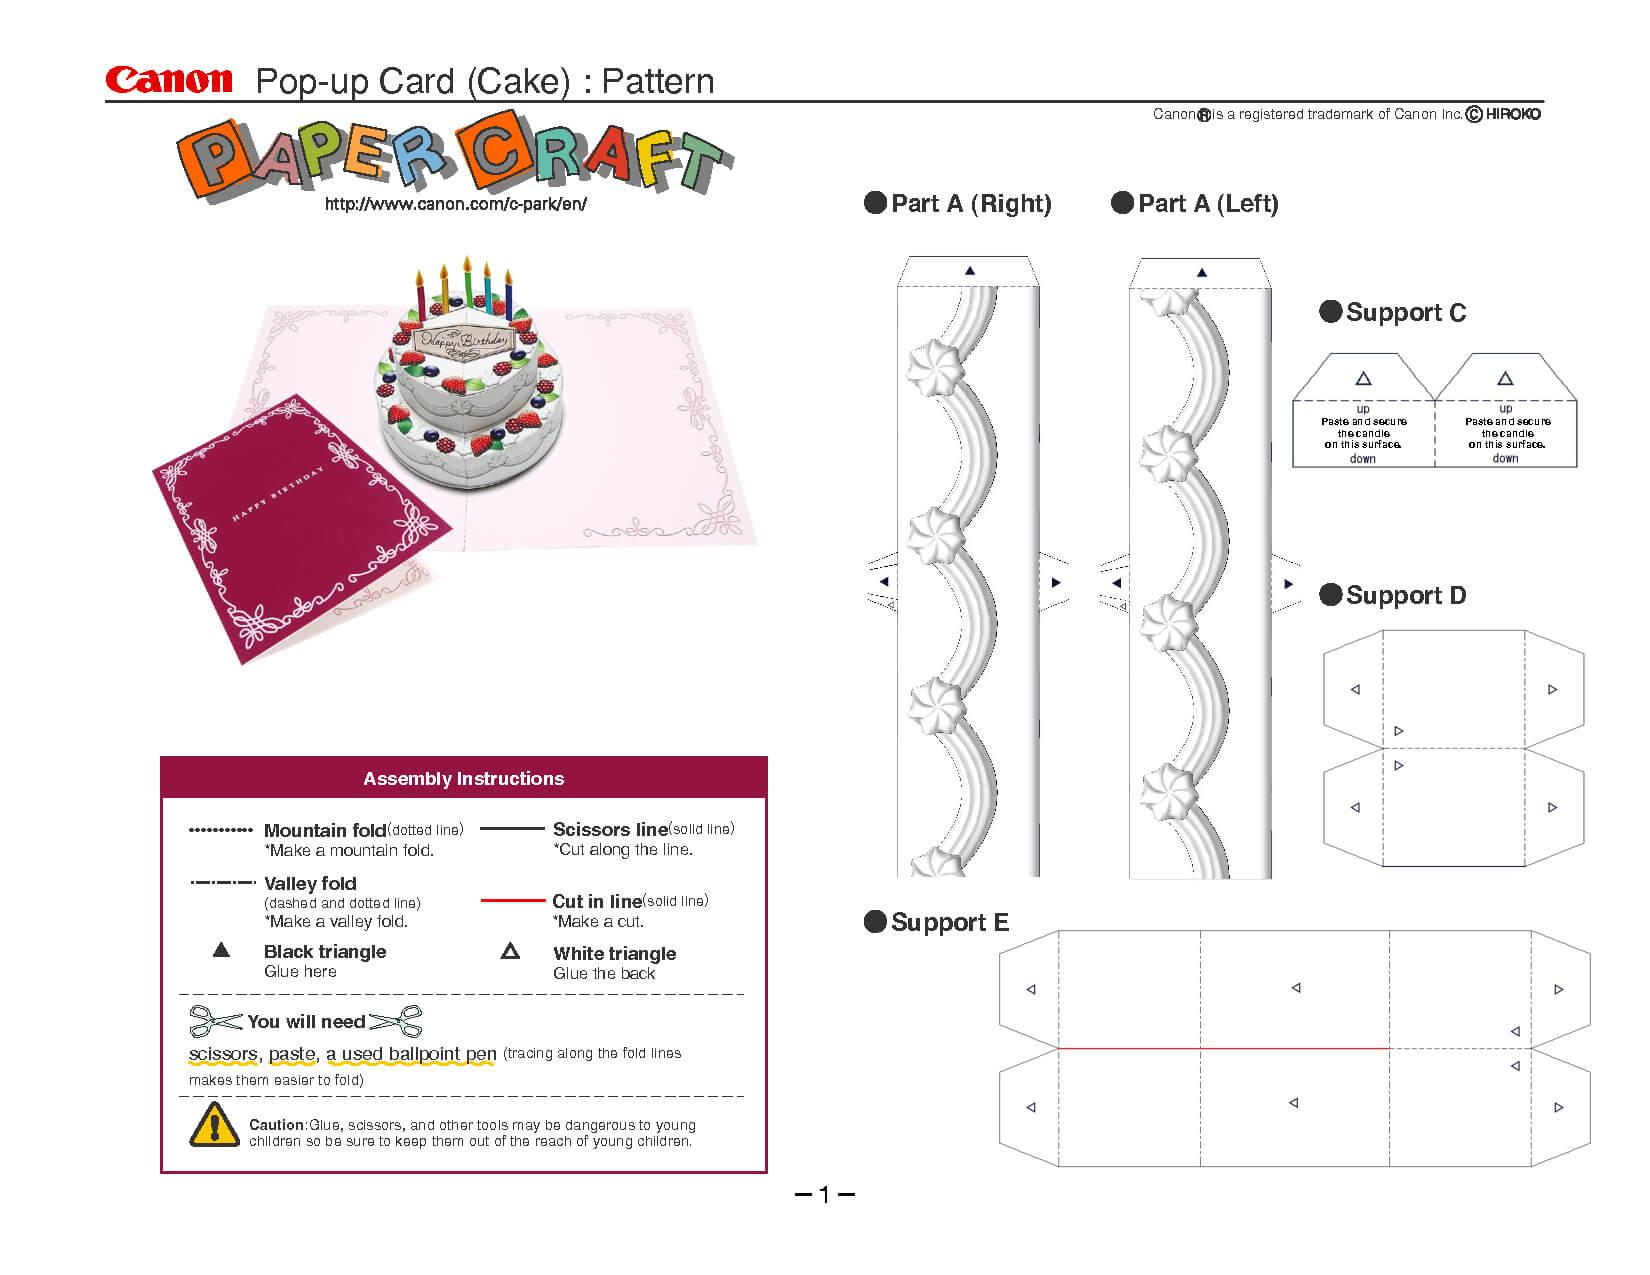 Birthday Cake Pop-Up Card Template | Pop Up Card Templates regarding Pop Up Wedding Card Template Free